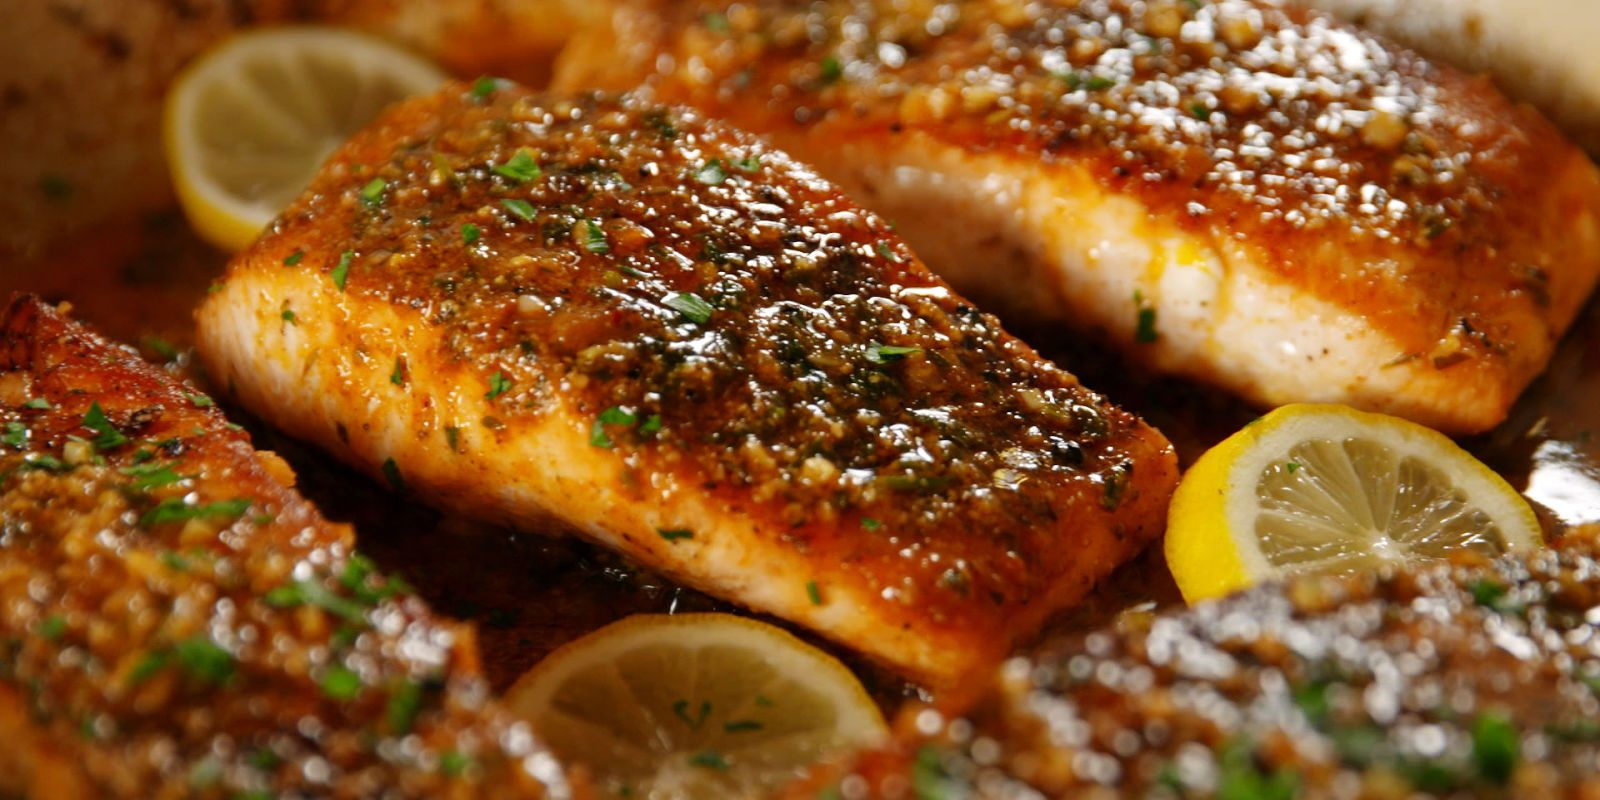 Cajun Parmesan Salmon Is Just The Kick You Need